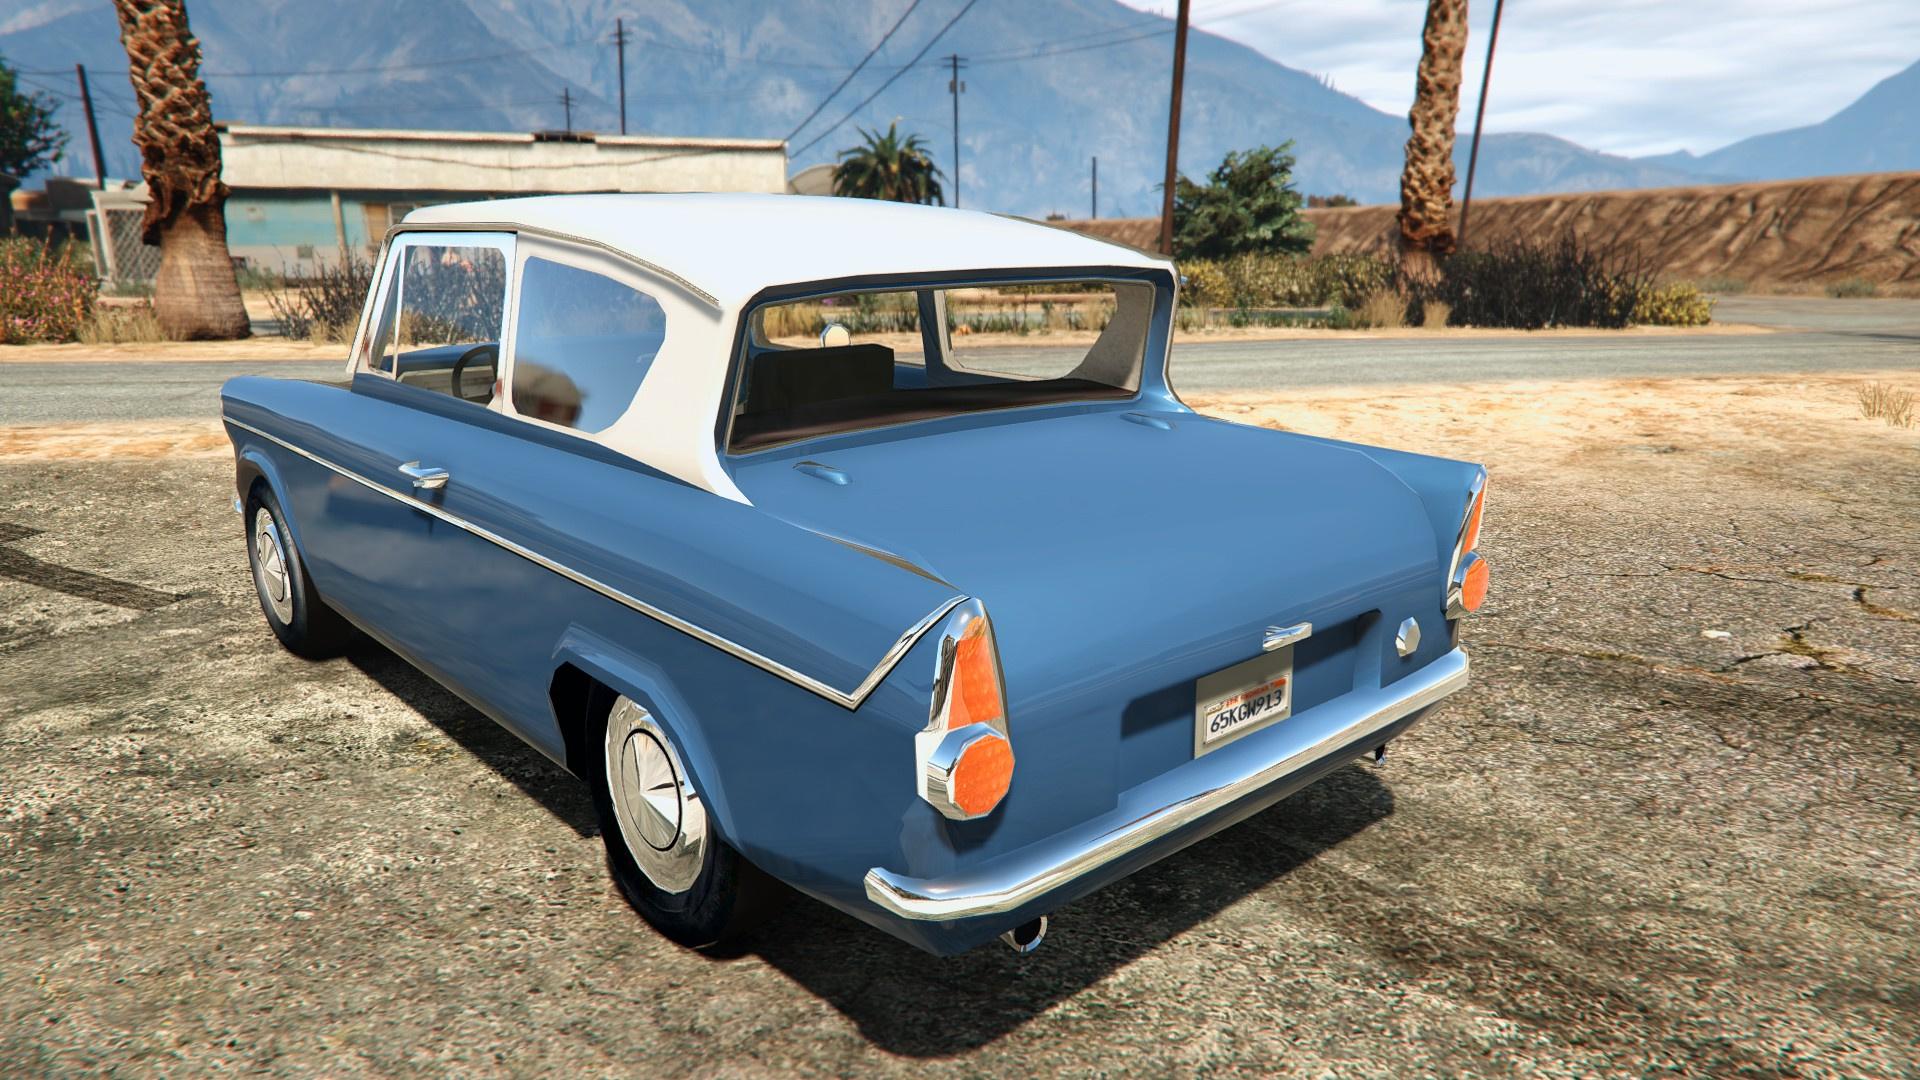 1959 Ford Anglia From Harry Potter Gta5 Mods Com